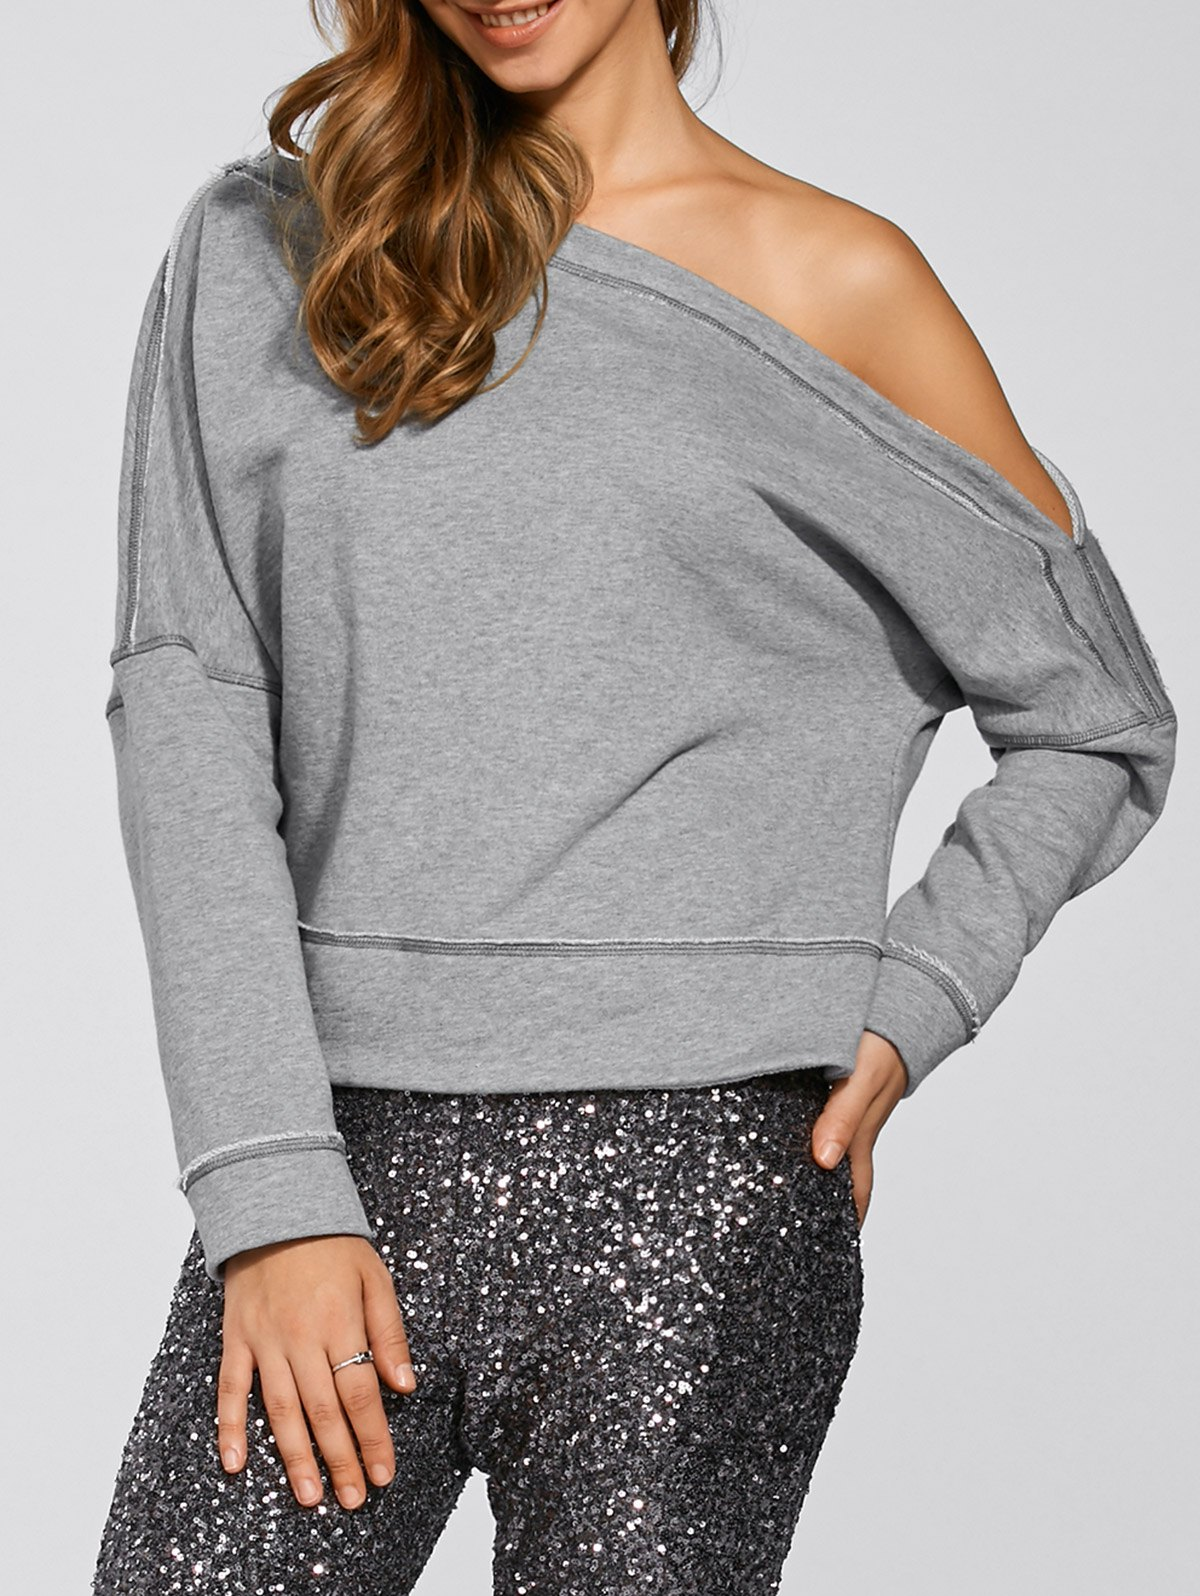 One-Shoulder Loose Casual Sweatshirt